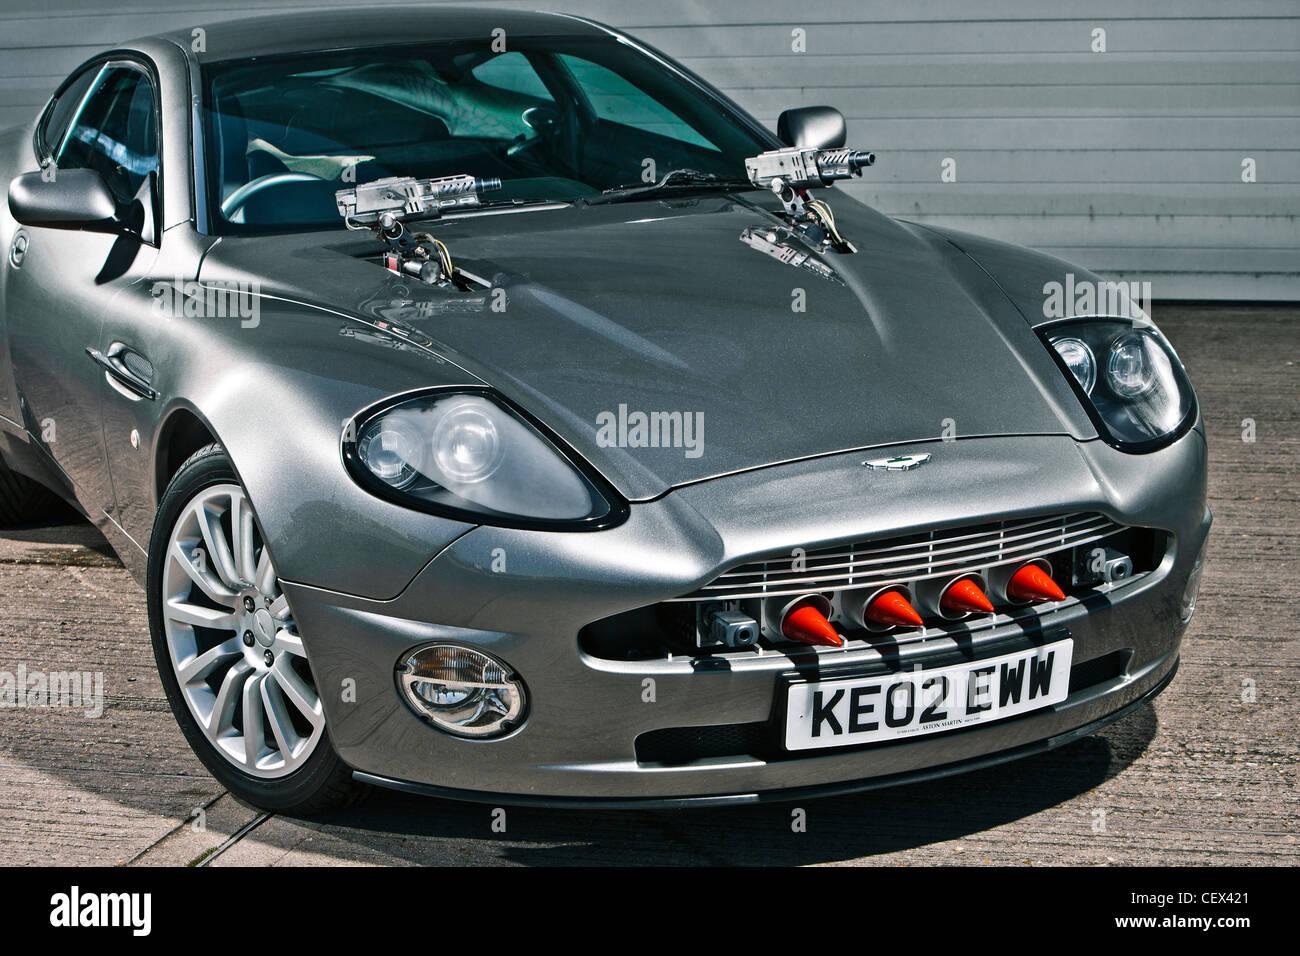 stationary aston martin db5, james bond classic car stock photo